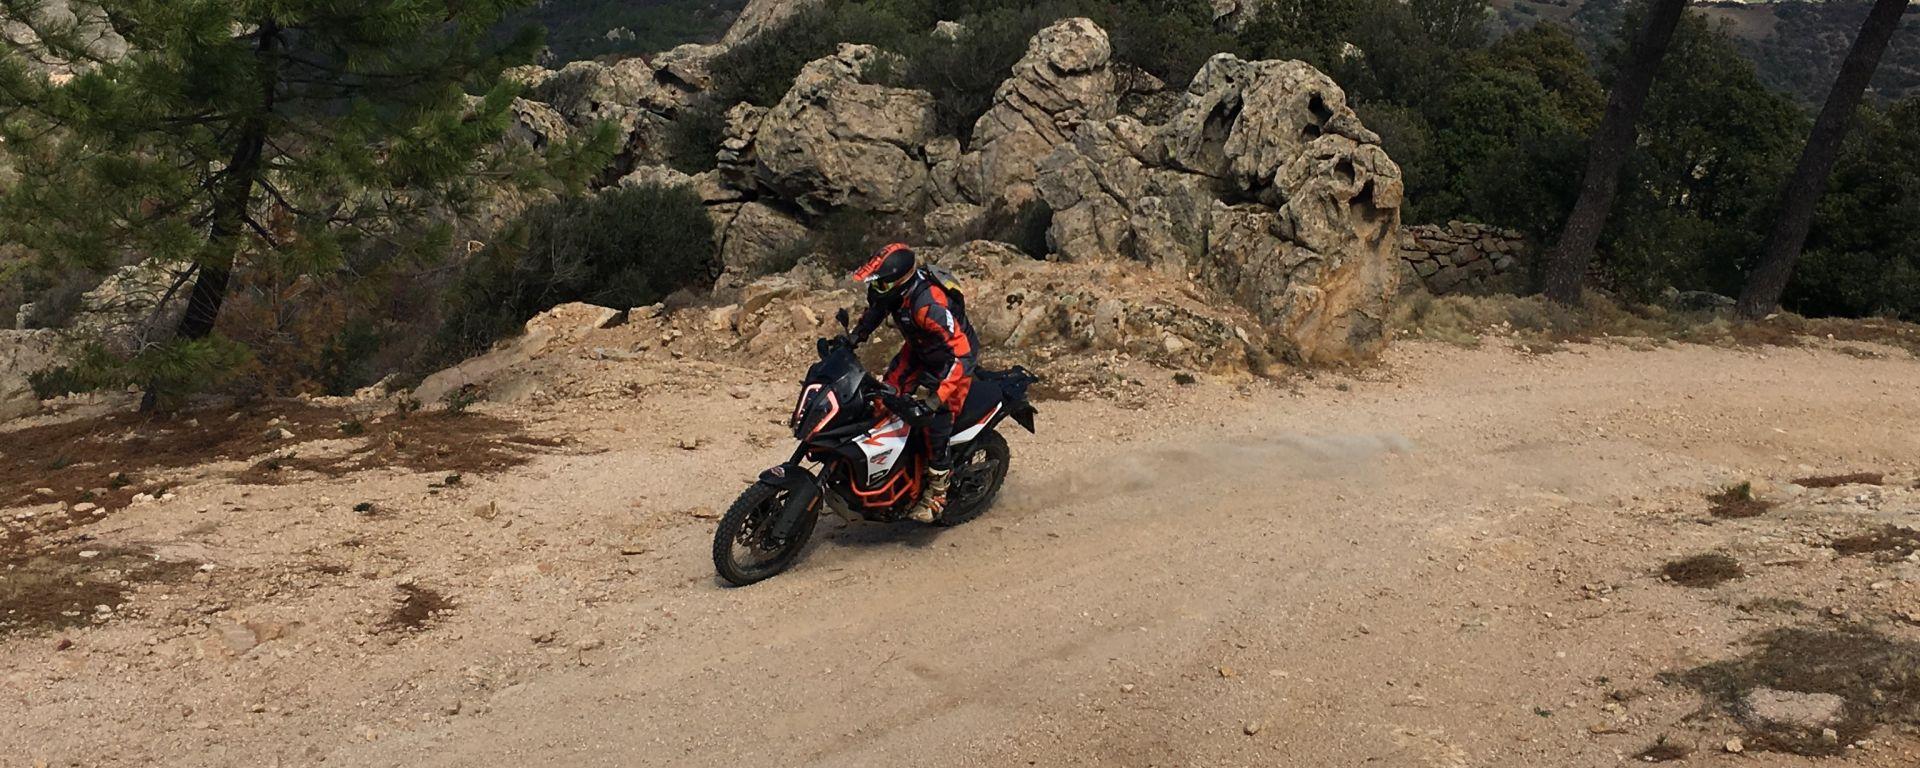 KTM: torna l'Adventure Rally, l'edizione 2018 sarà in Sardegna